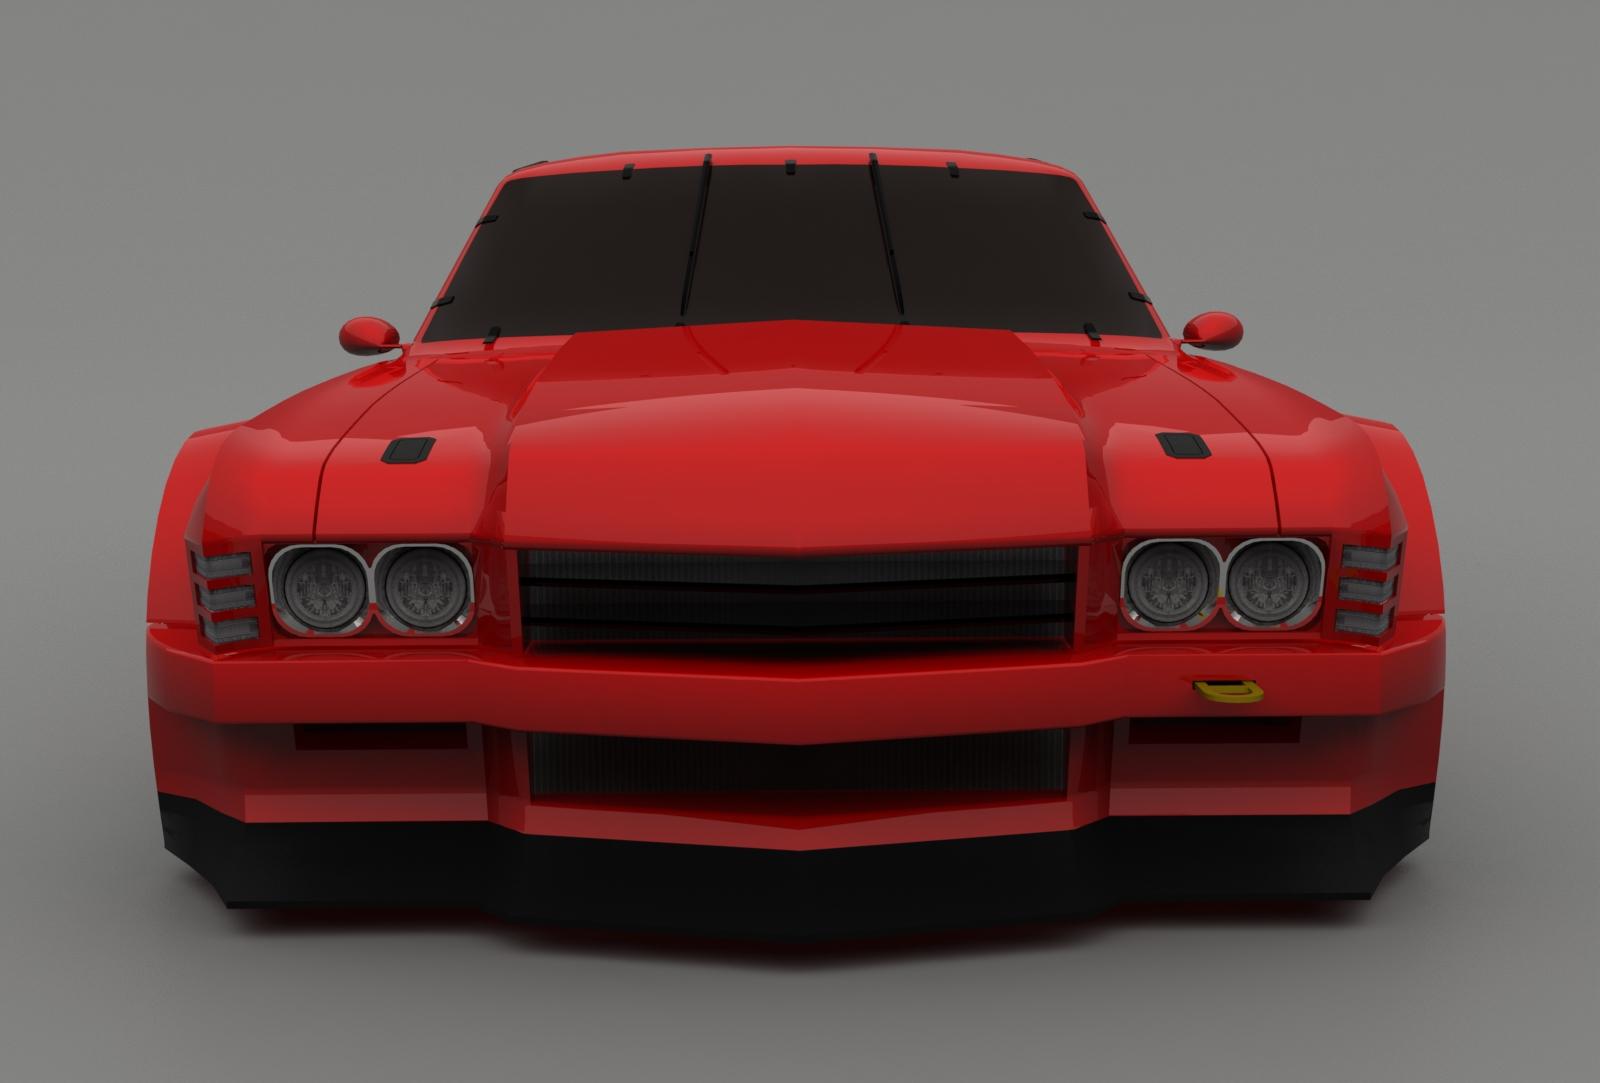 2013-03_The Crew_F.Beudin_Chevrolet Impala-1967-Racing2 Design_01